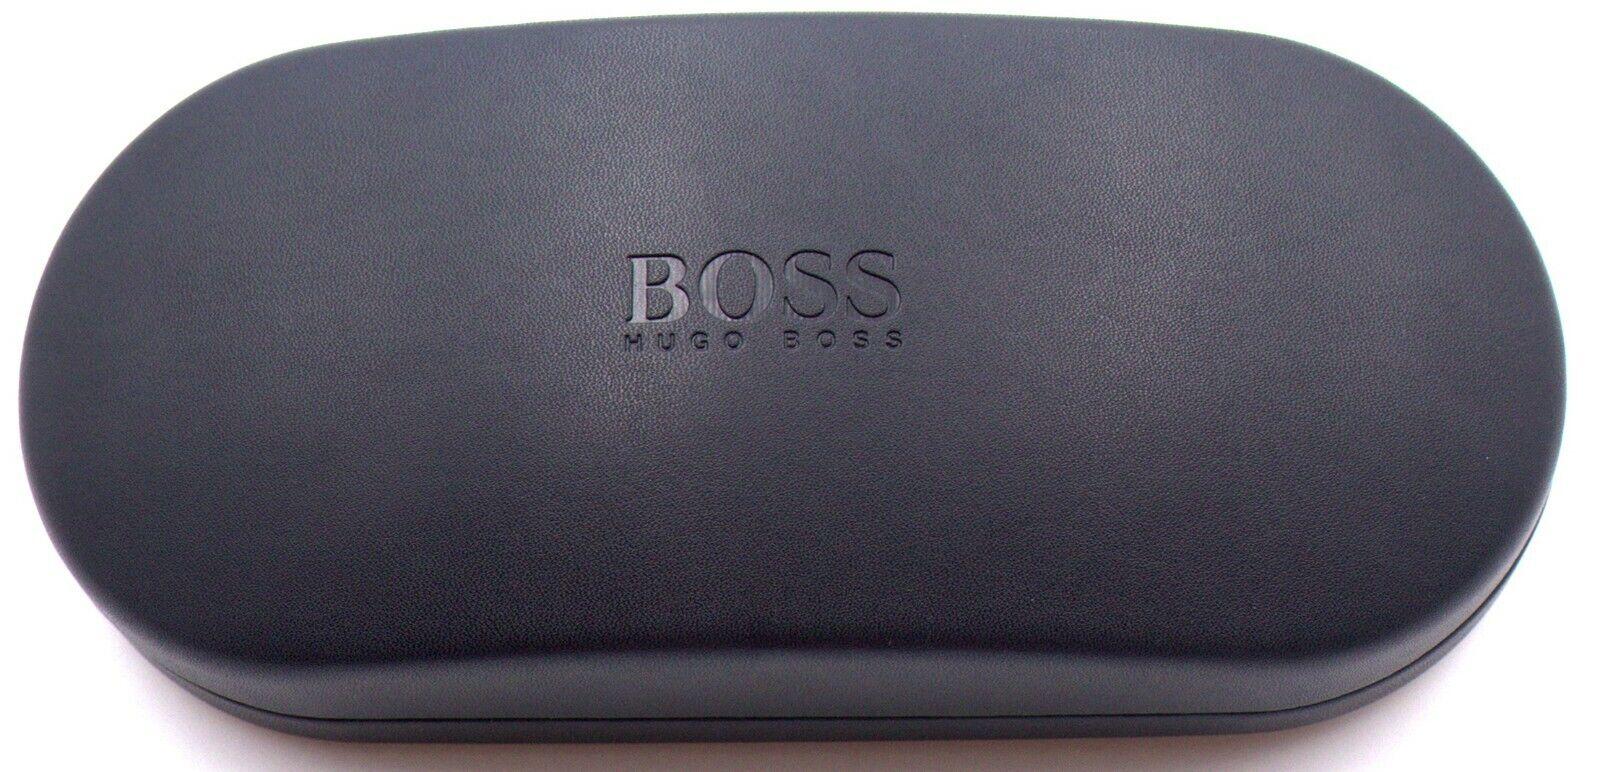 Boss Orange Damen Herren Brillenfassung BO0303 003 54mm schwarz matt BO16 18 B